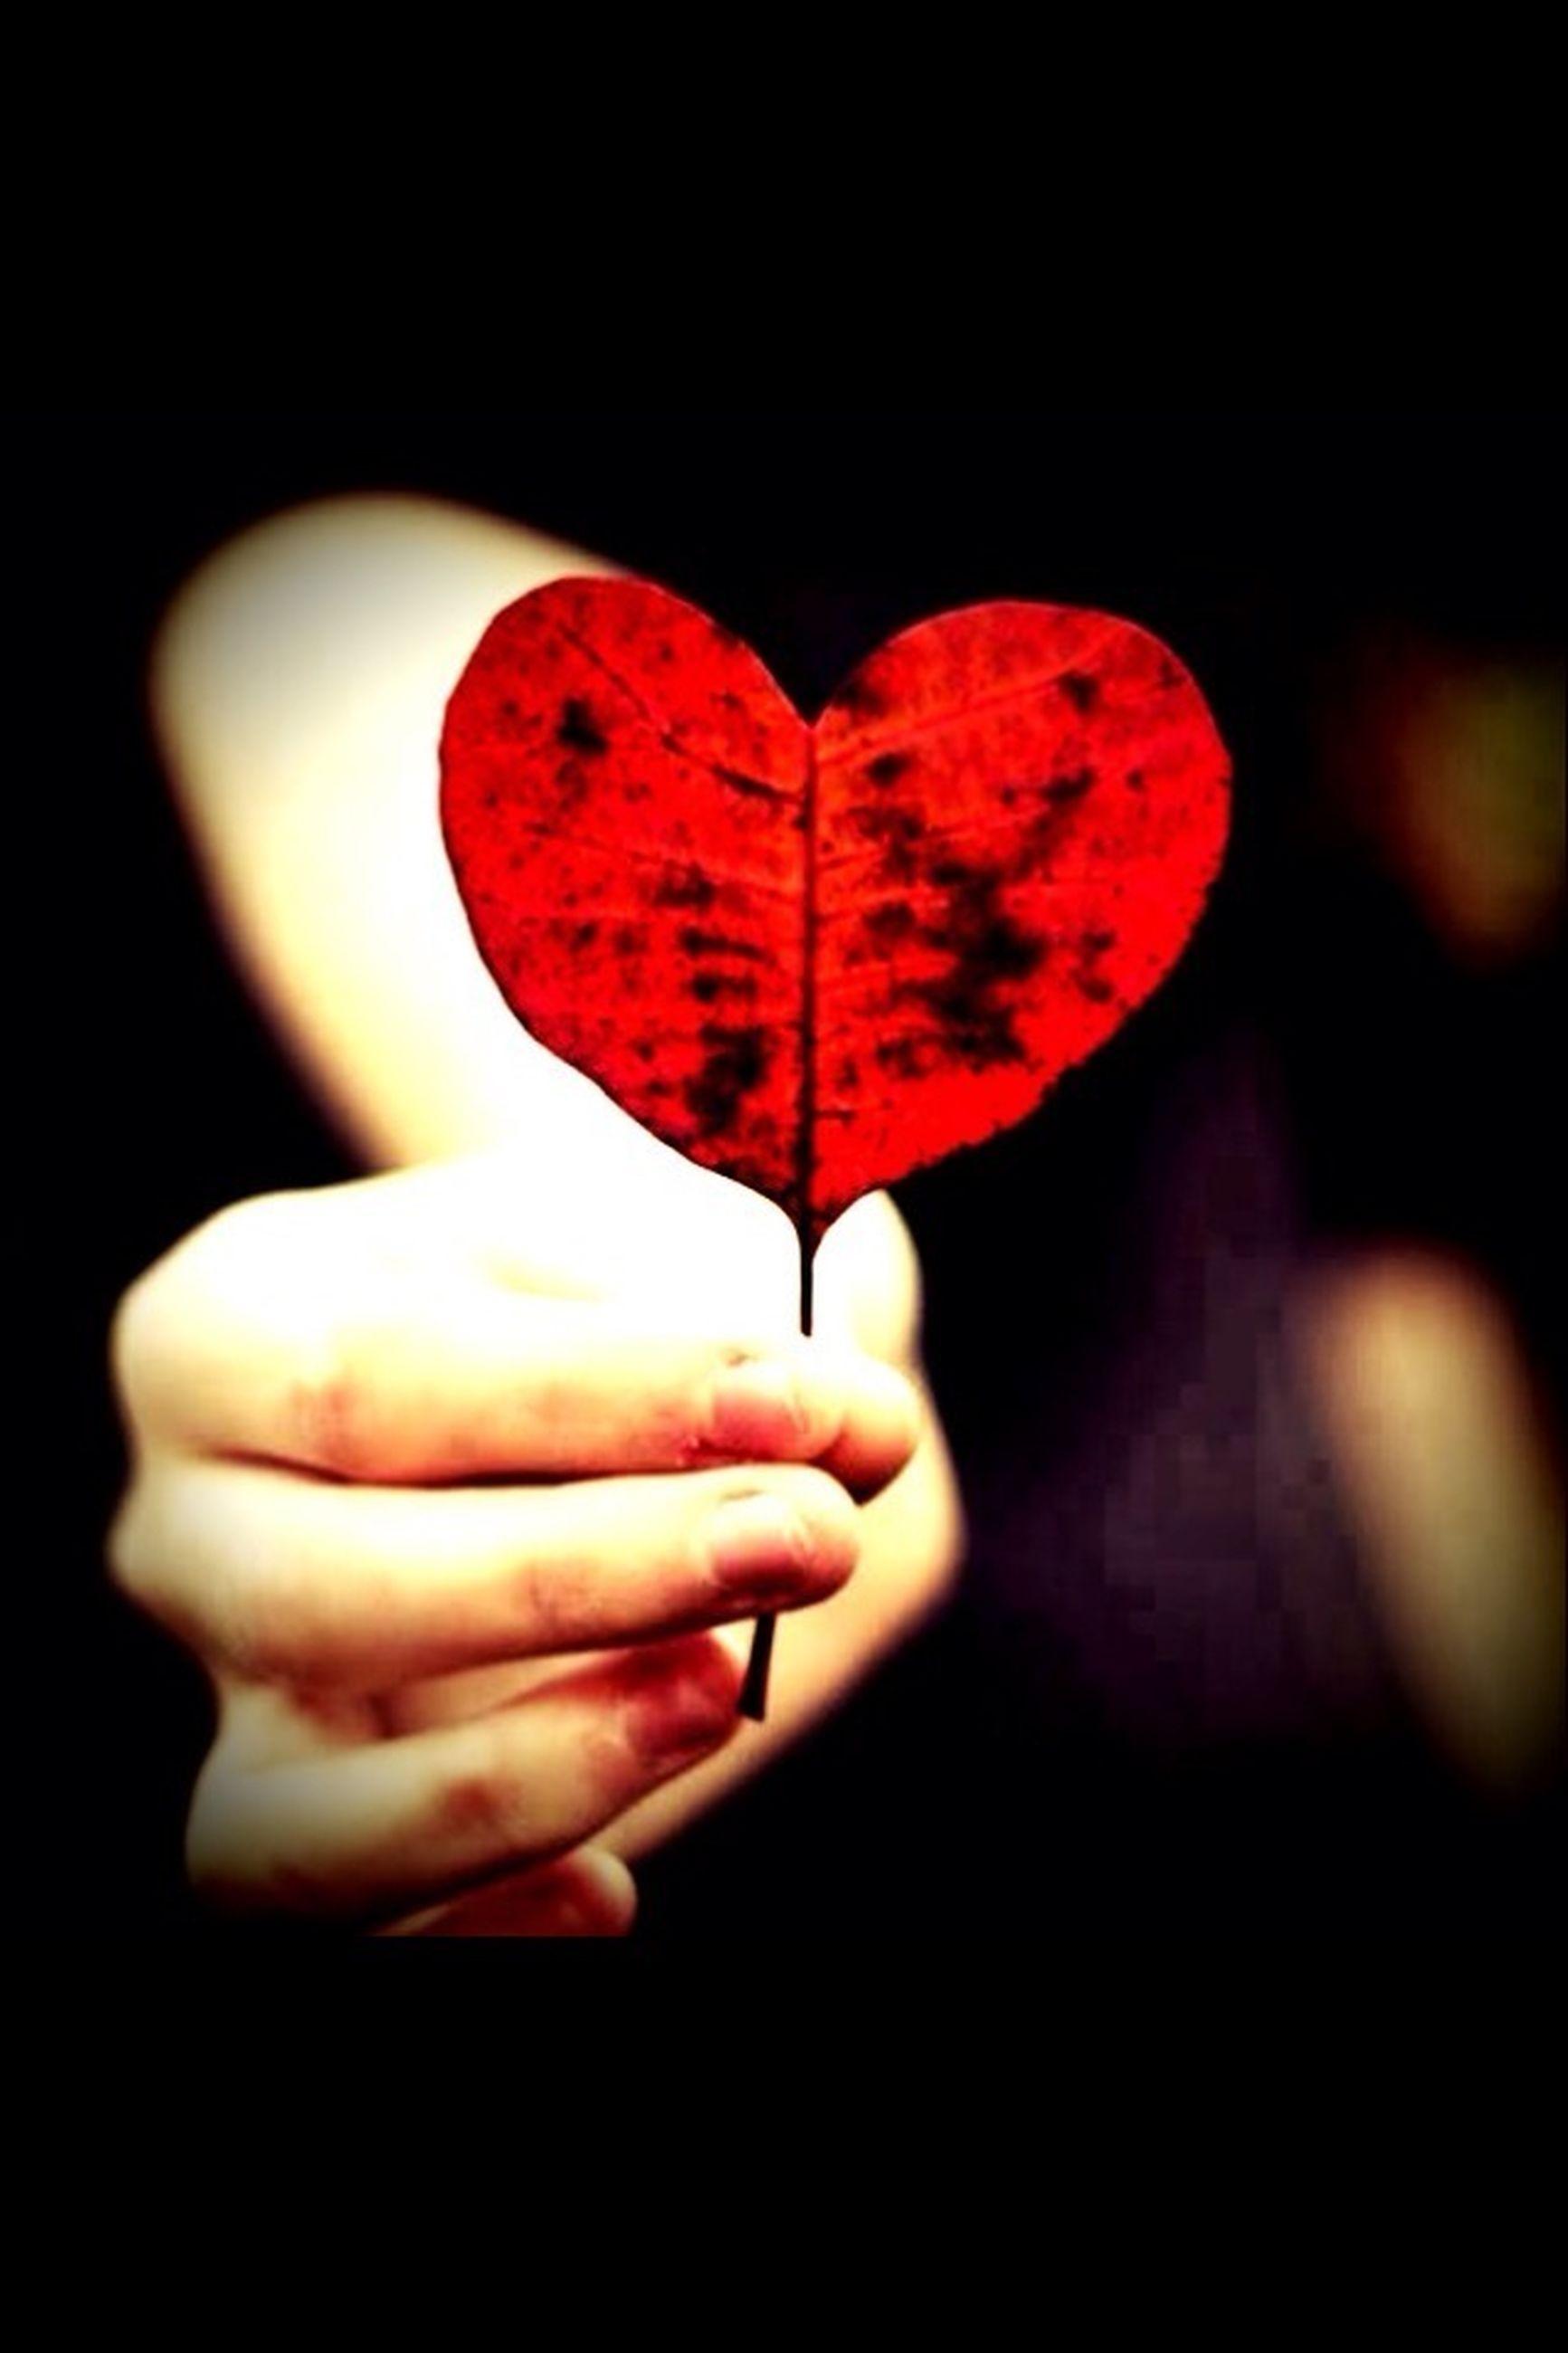 red, close-up, leaf, studio shot, single object, focus on foreground, heart shape, black background, love, indoors, no people, freshness, selective focus, nature, autumn, still life, maple leaf, leaf vein, stem, day